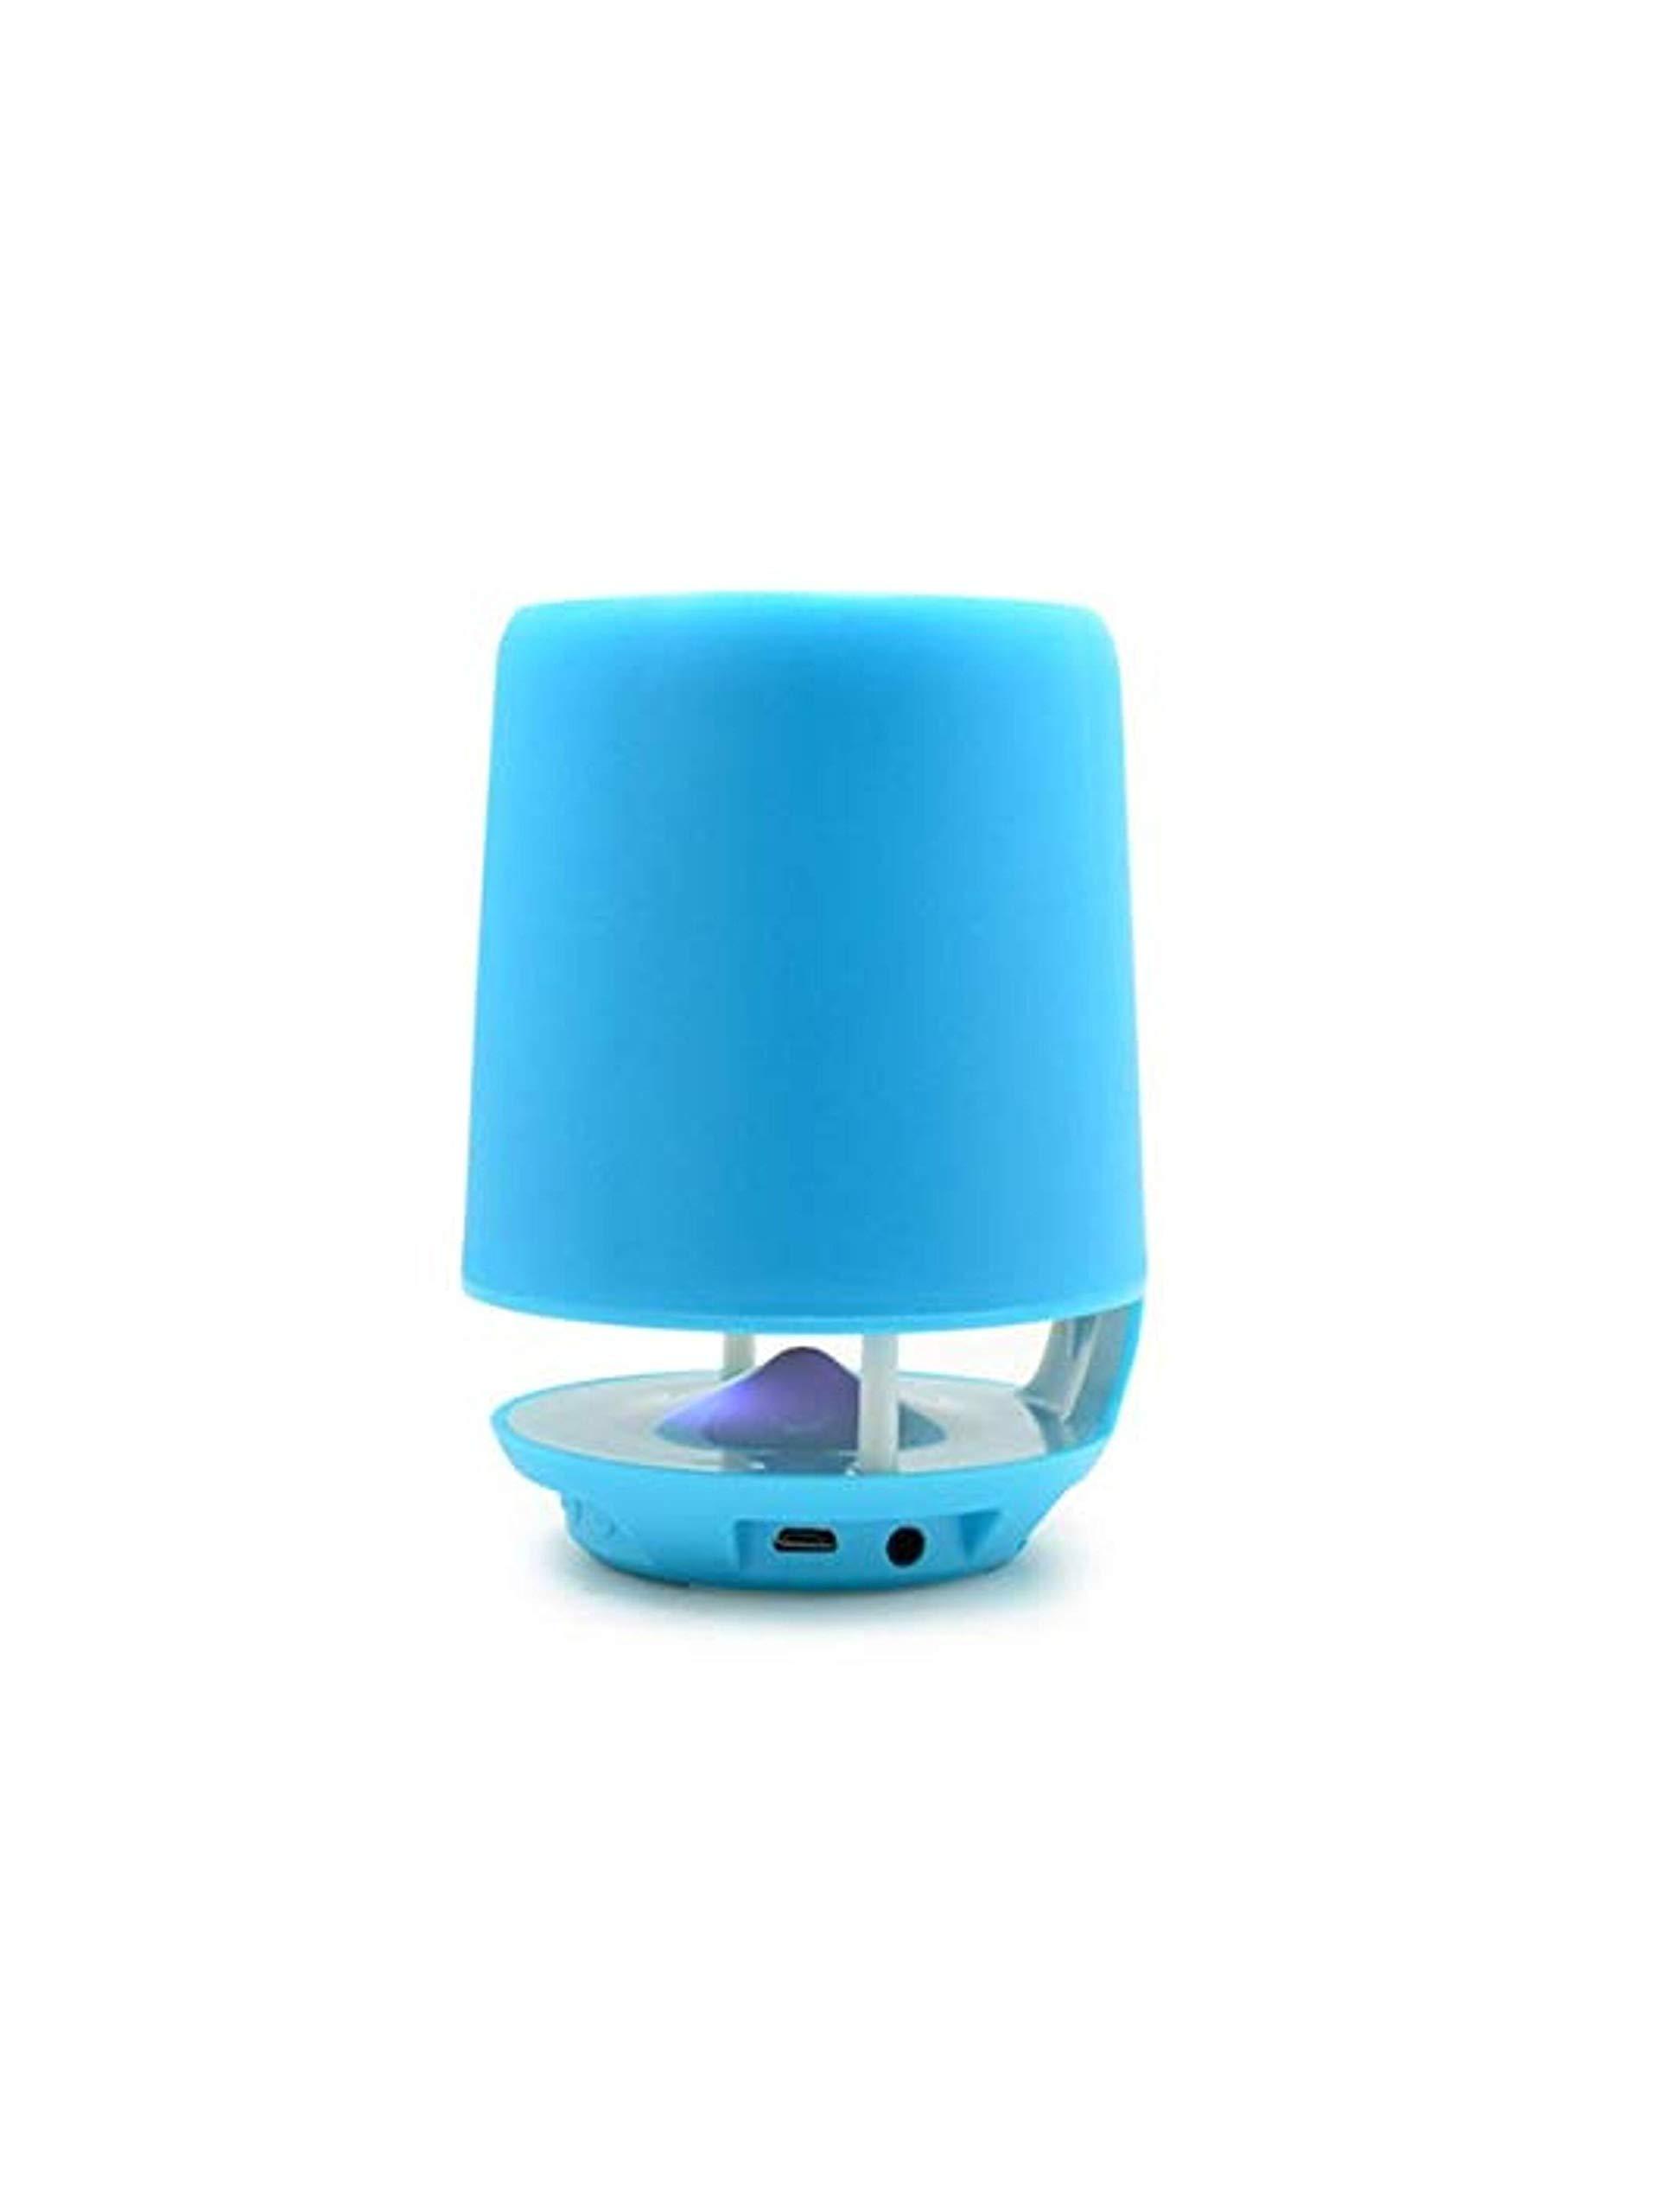 Prosmart Bluetooth Backlight 304B Wireless